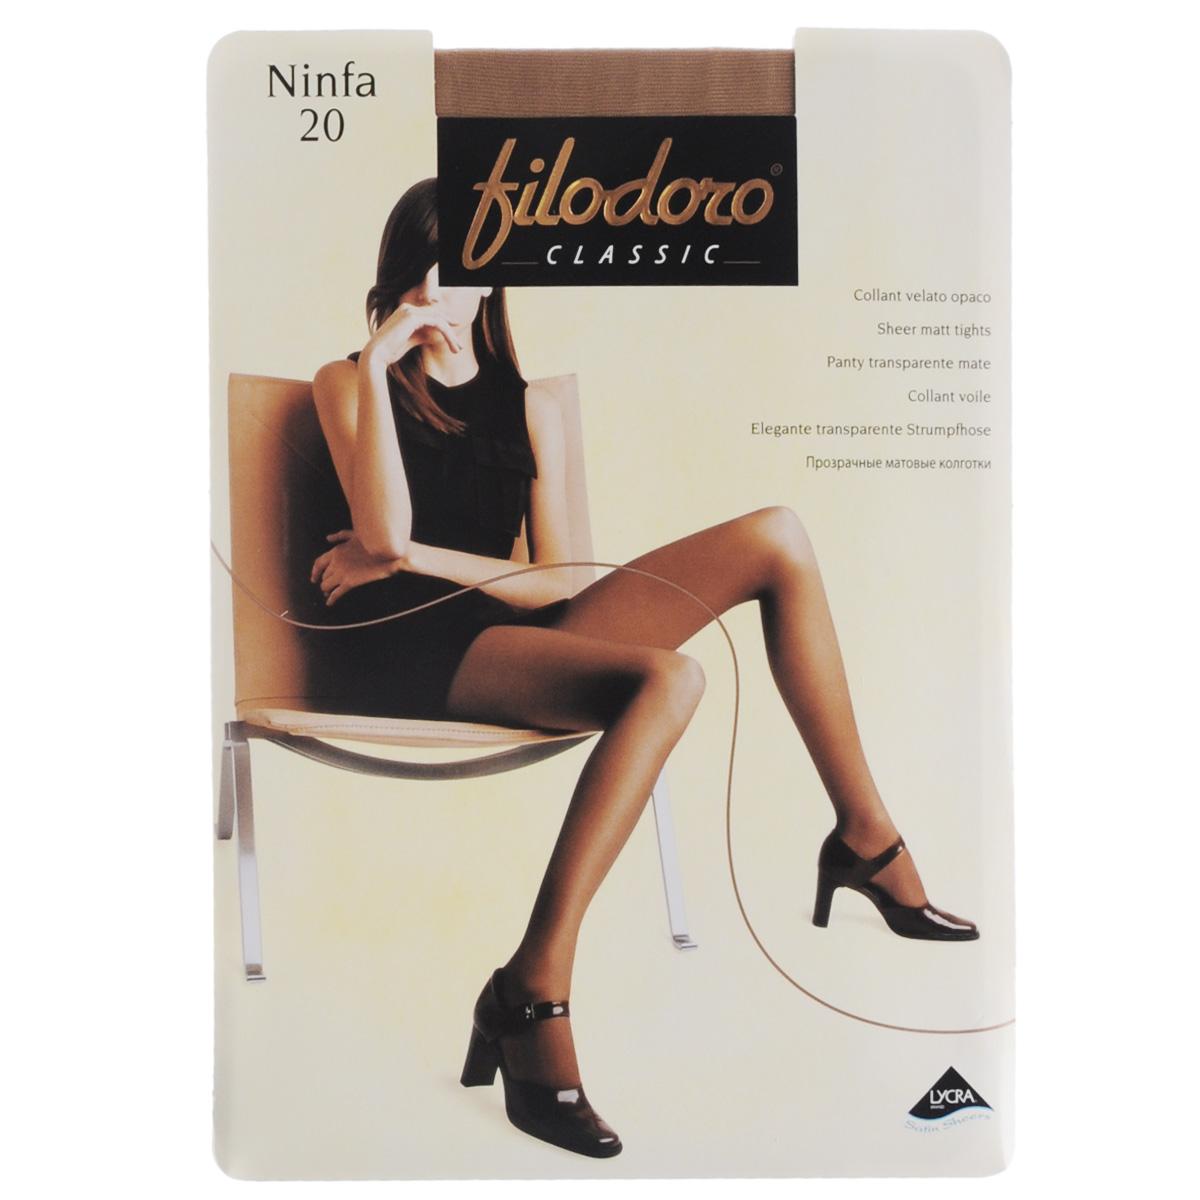 Колготки женские Filodoro Classic Ninfa 20, цвет: Cognac (загар). C109172FC. Размер 5 (Maxi-XL) колготки женские filodoro classic ninfa 20 цвет nero черный c109172fc размер 2 s